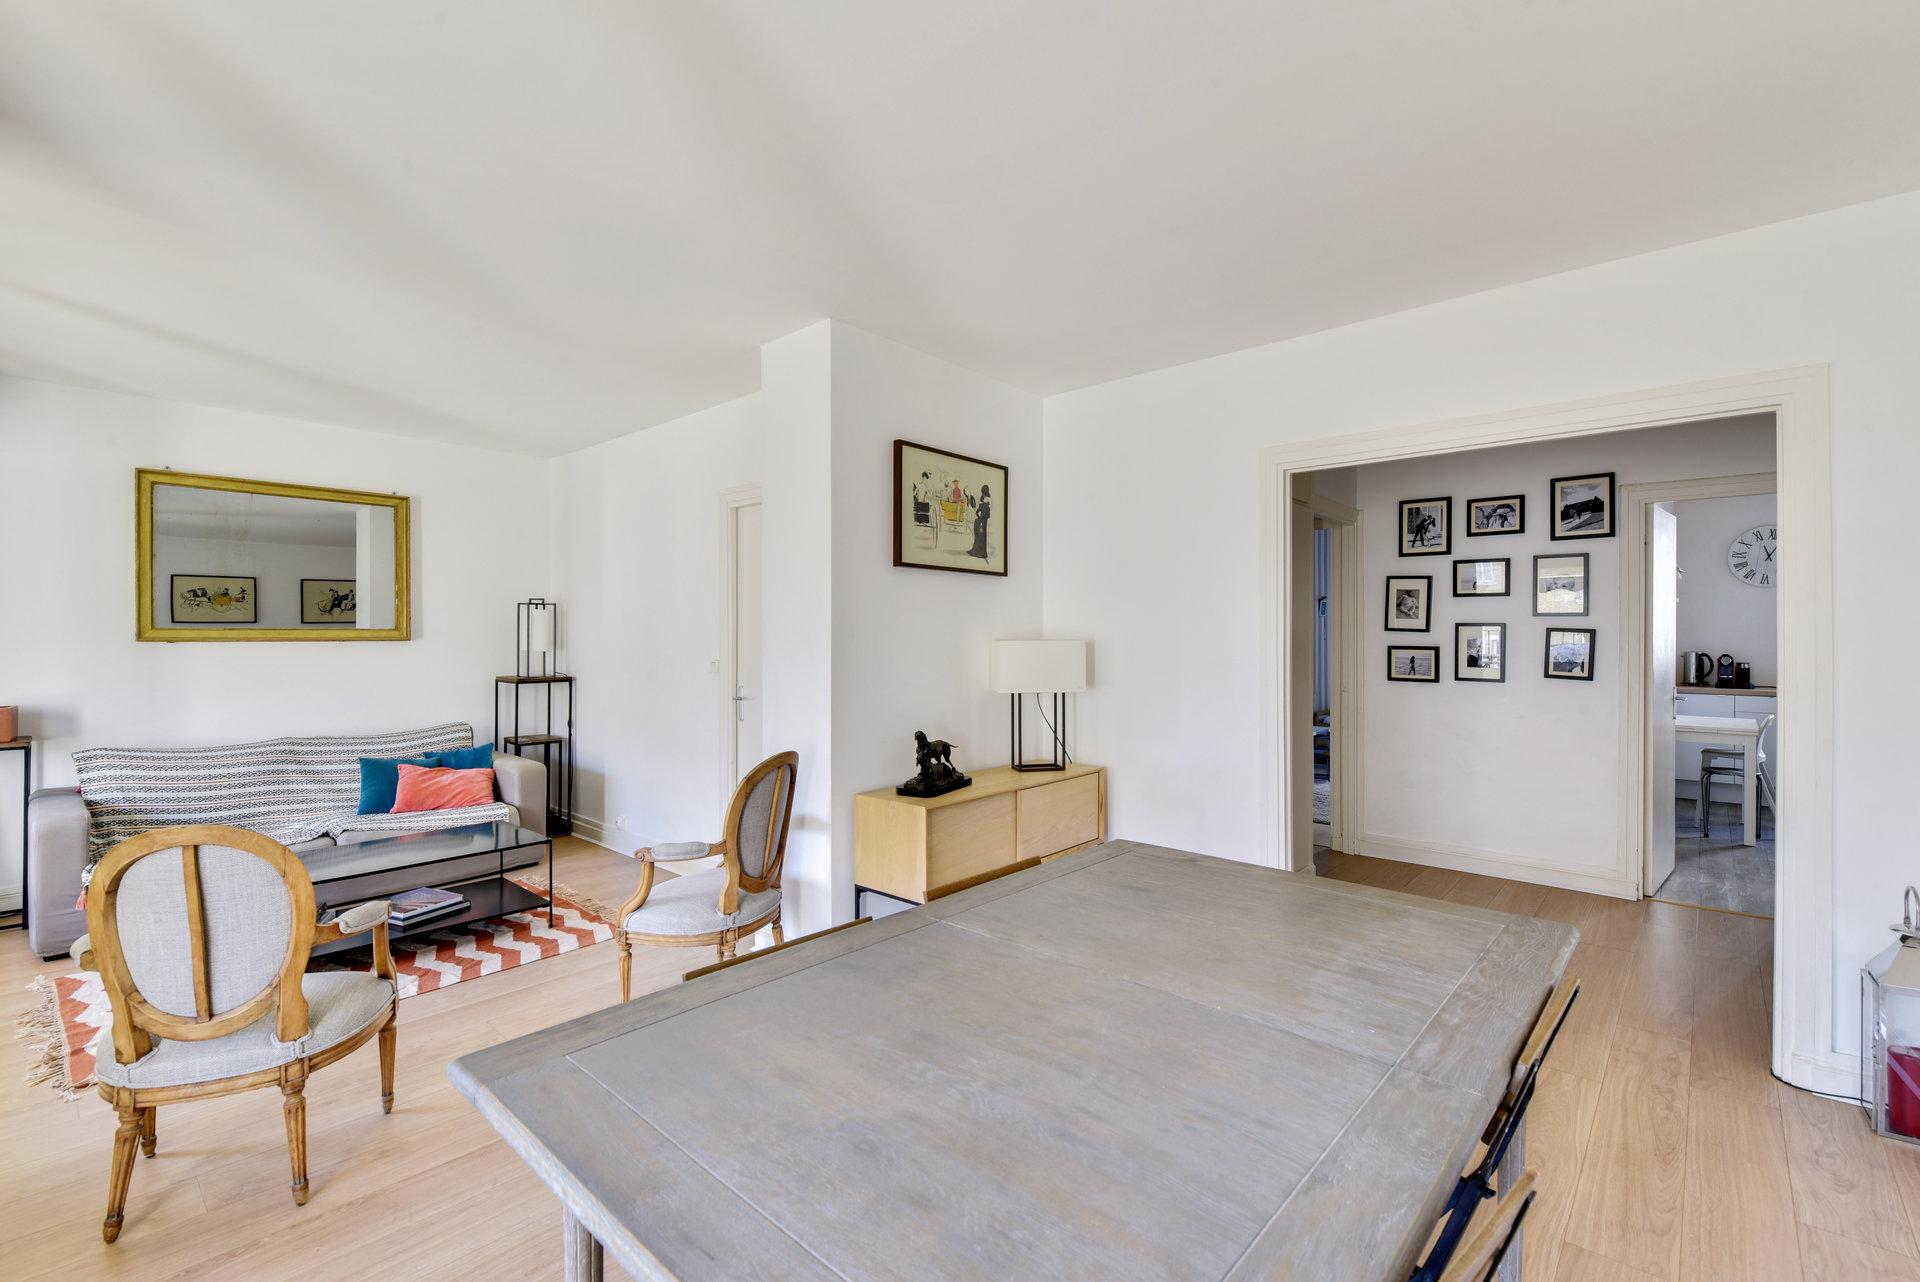 Appartement 2 chambres Boulogne proche Marcel Sembat